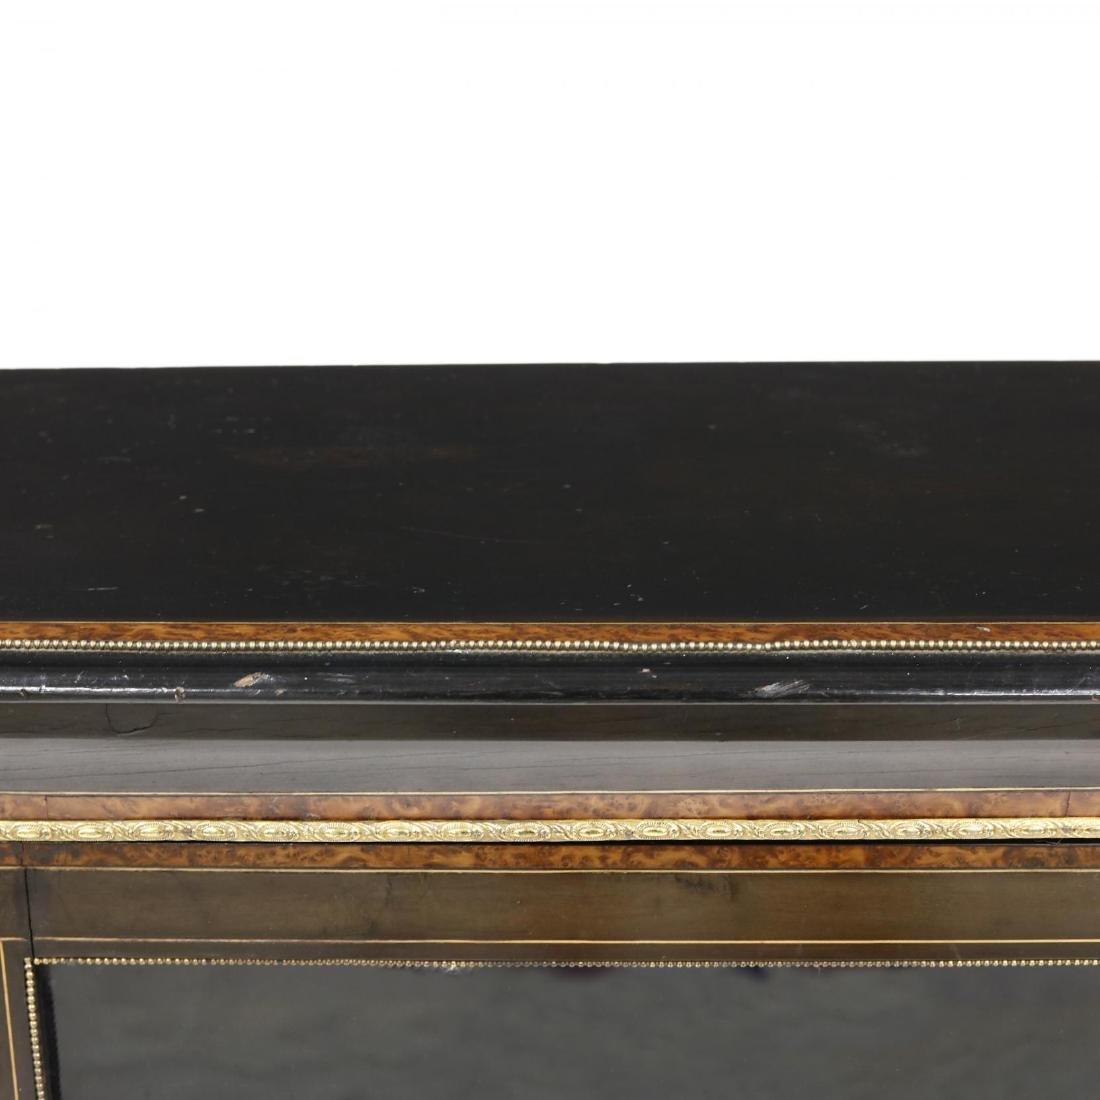 Edwardian Inlaid Credenza - 5